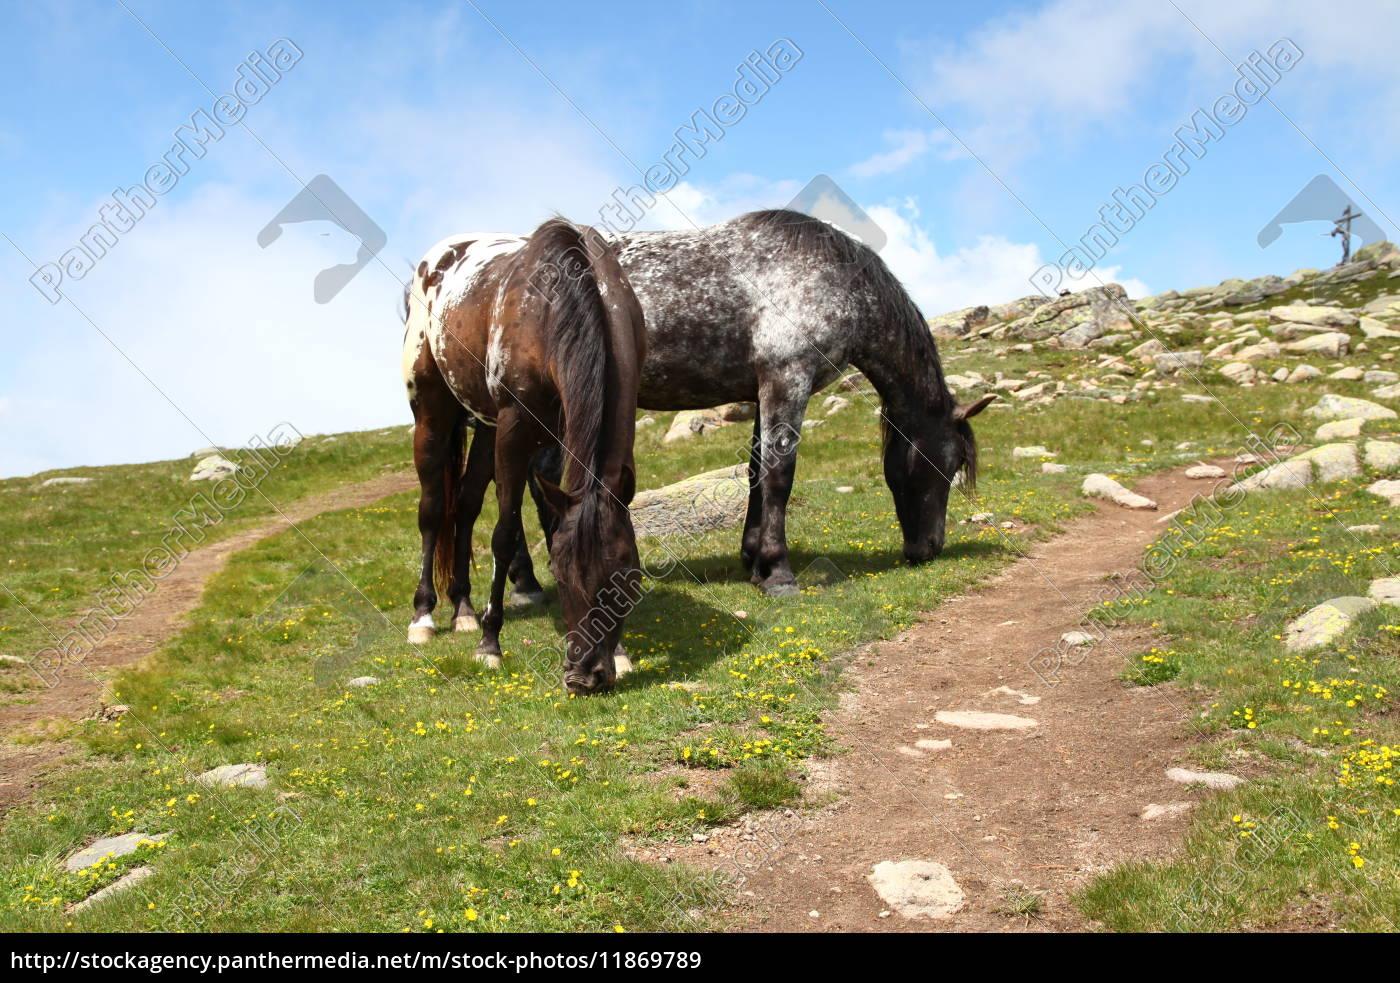 Südtirol, Pferd, Dolomiten, Pferde, Urlaub, Natur - 11869789